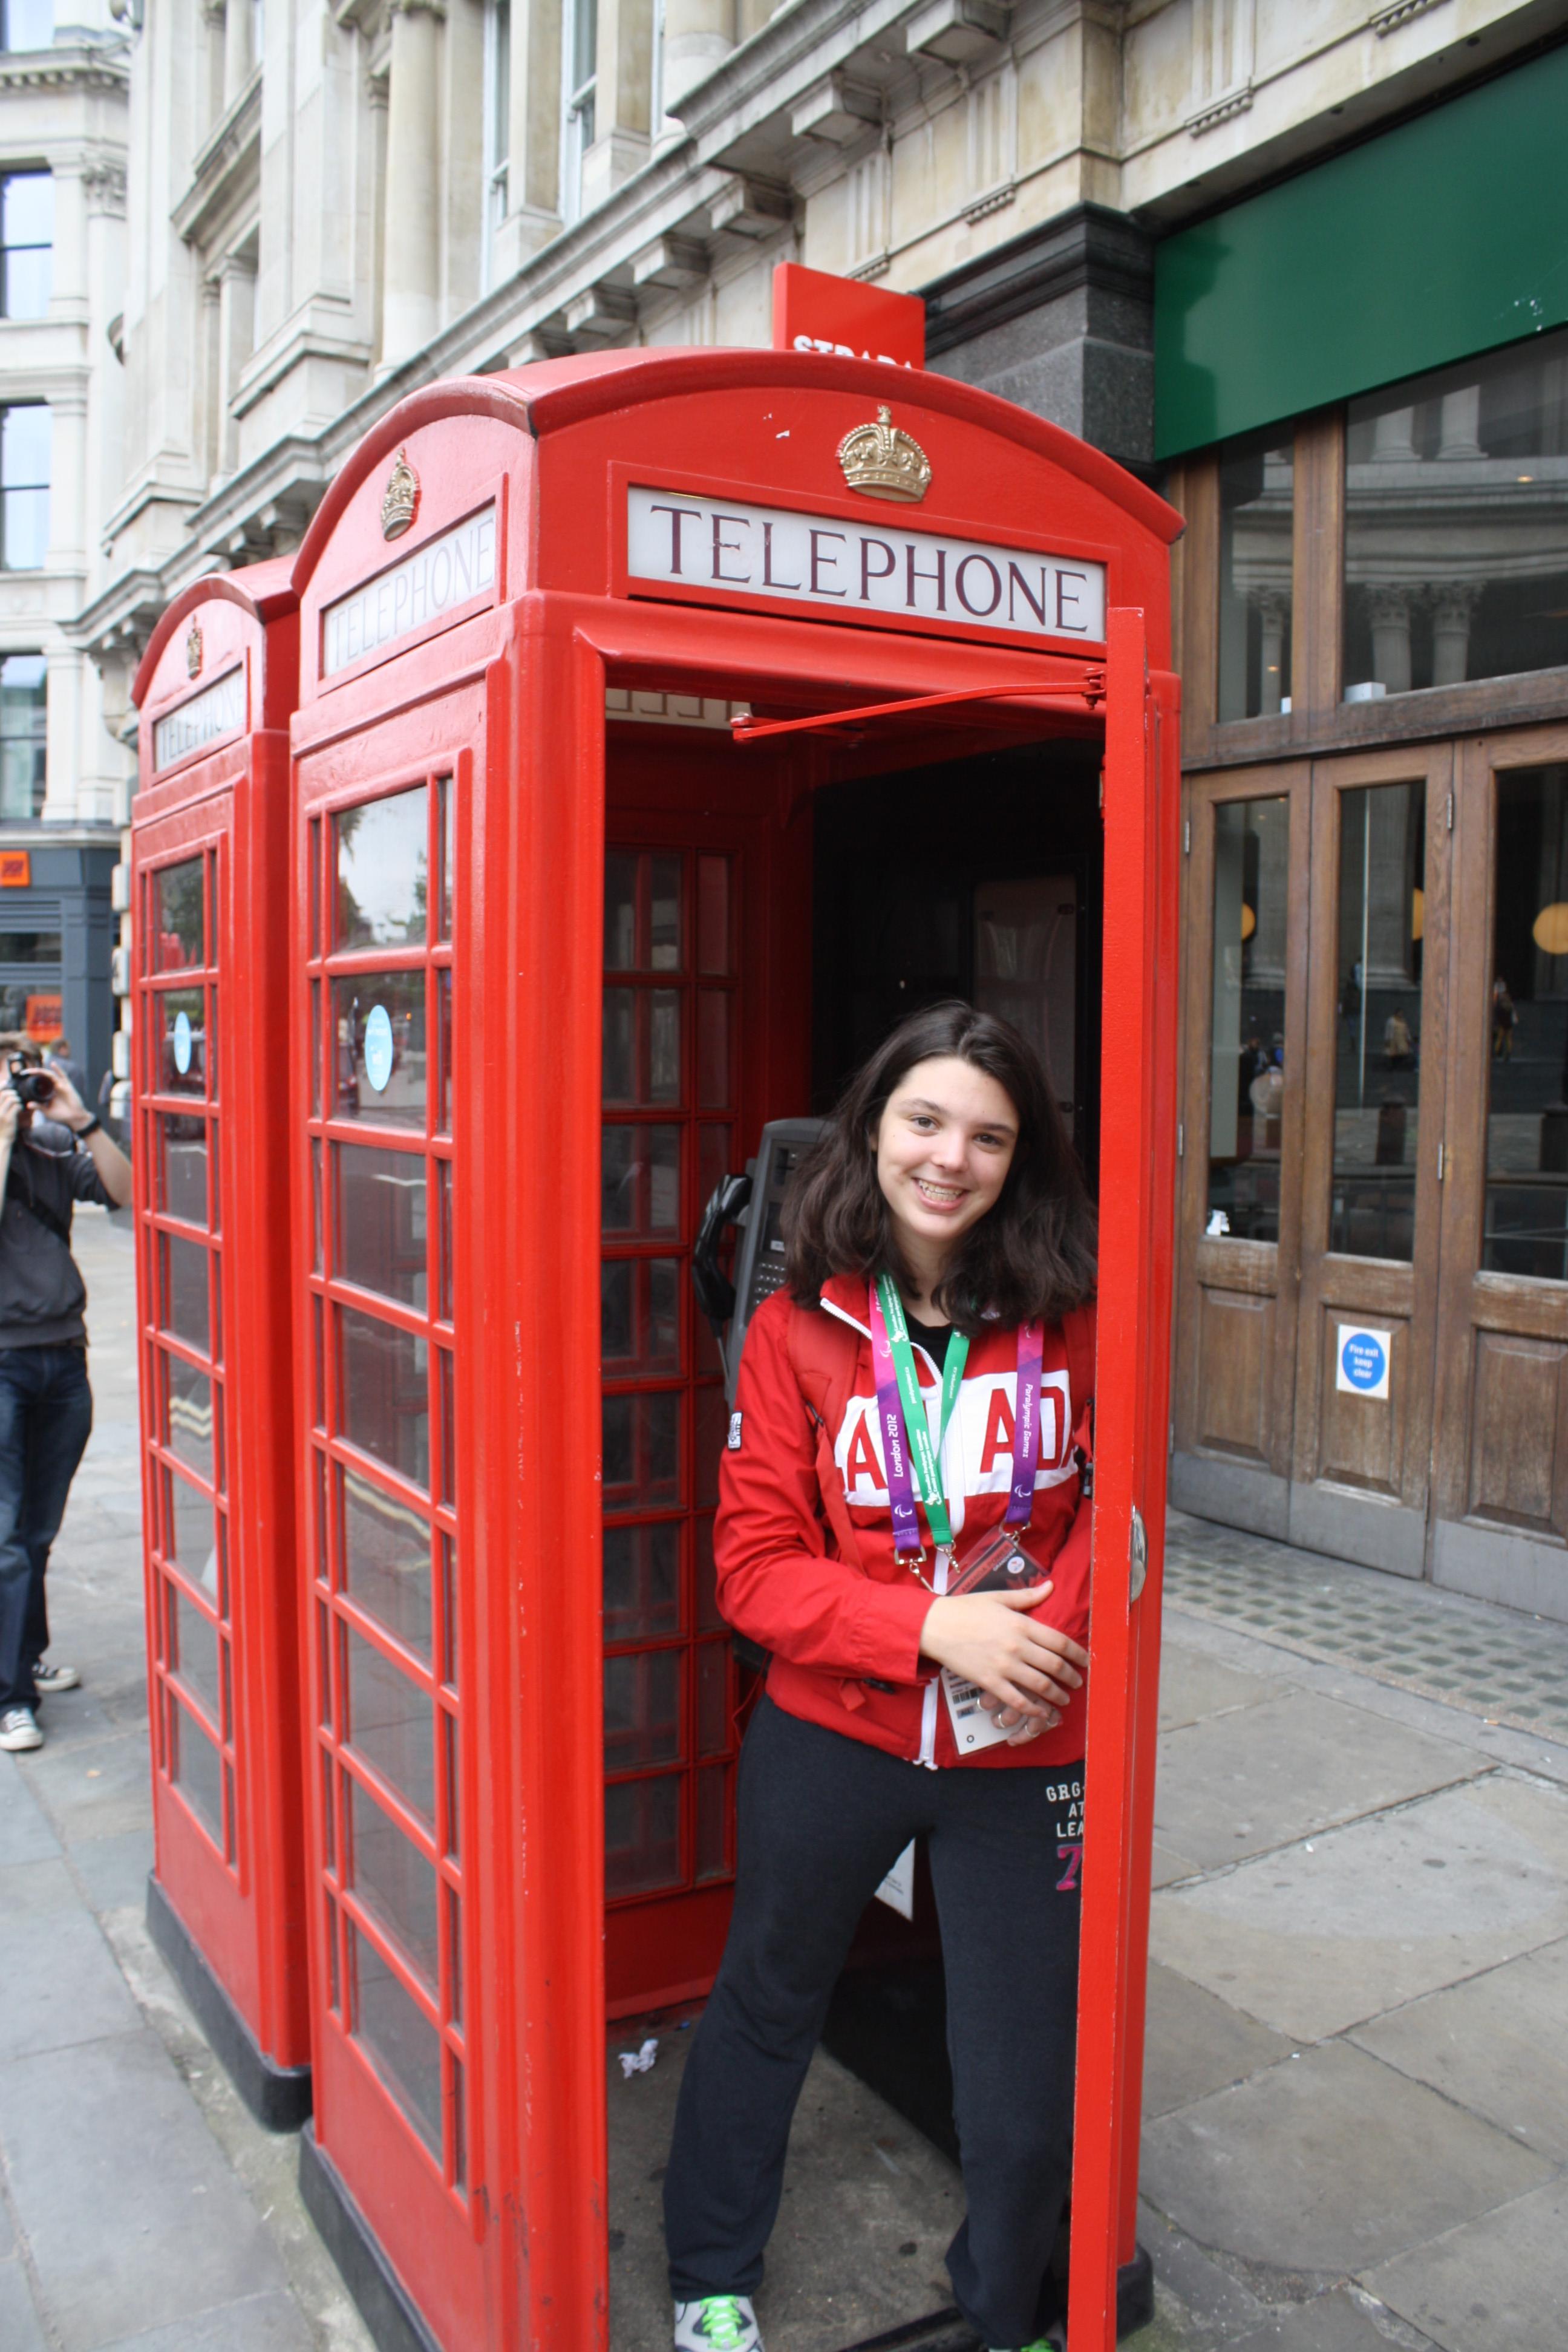 Amanda phone booth